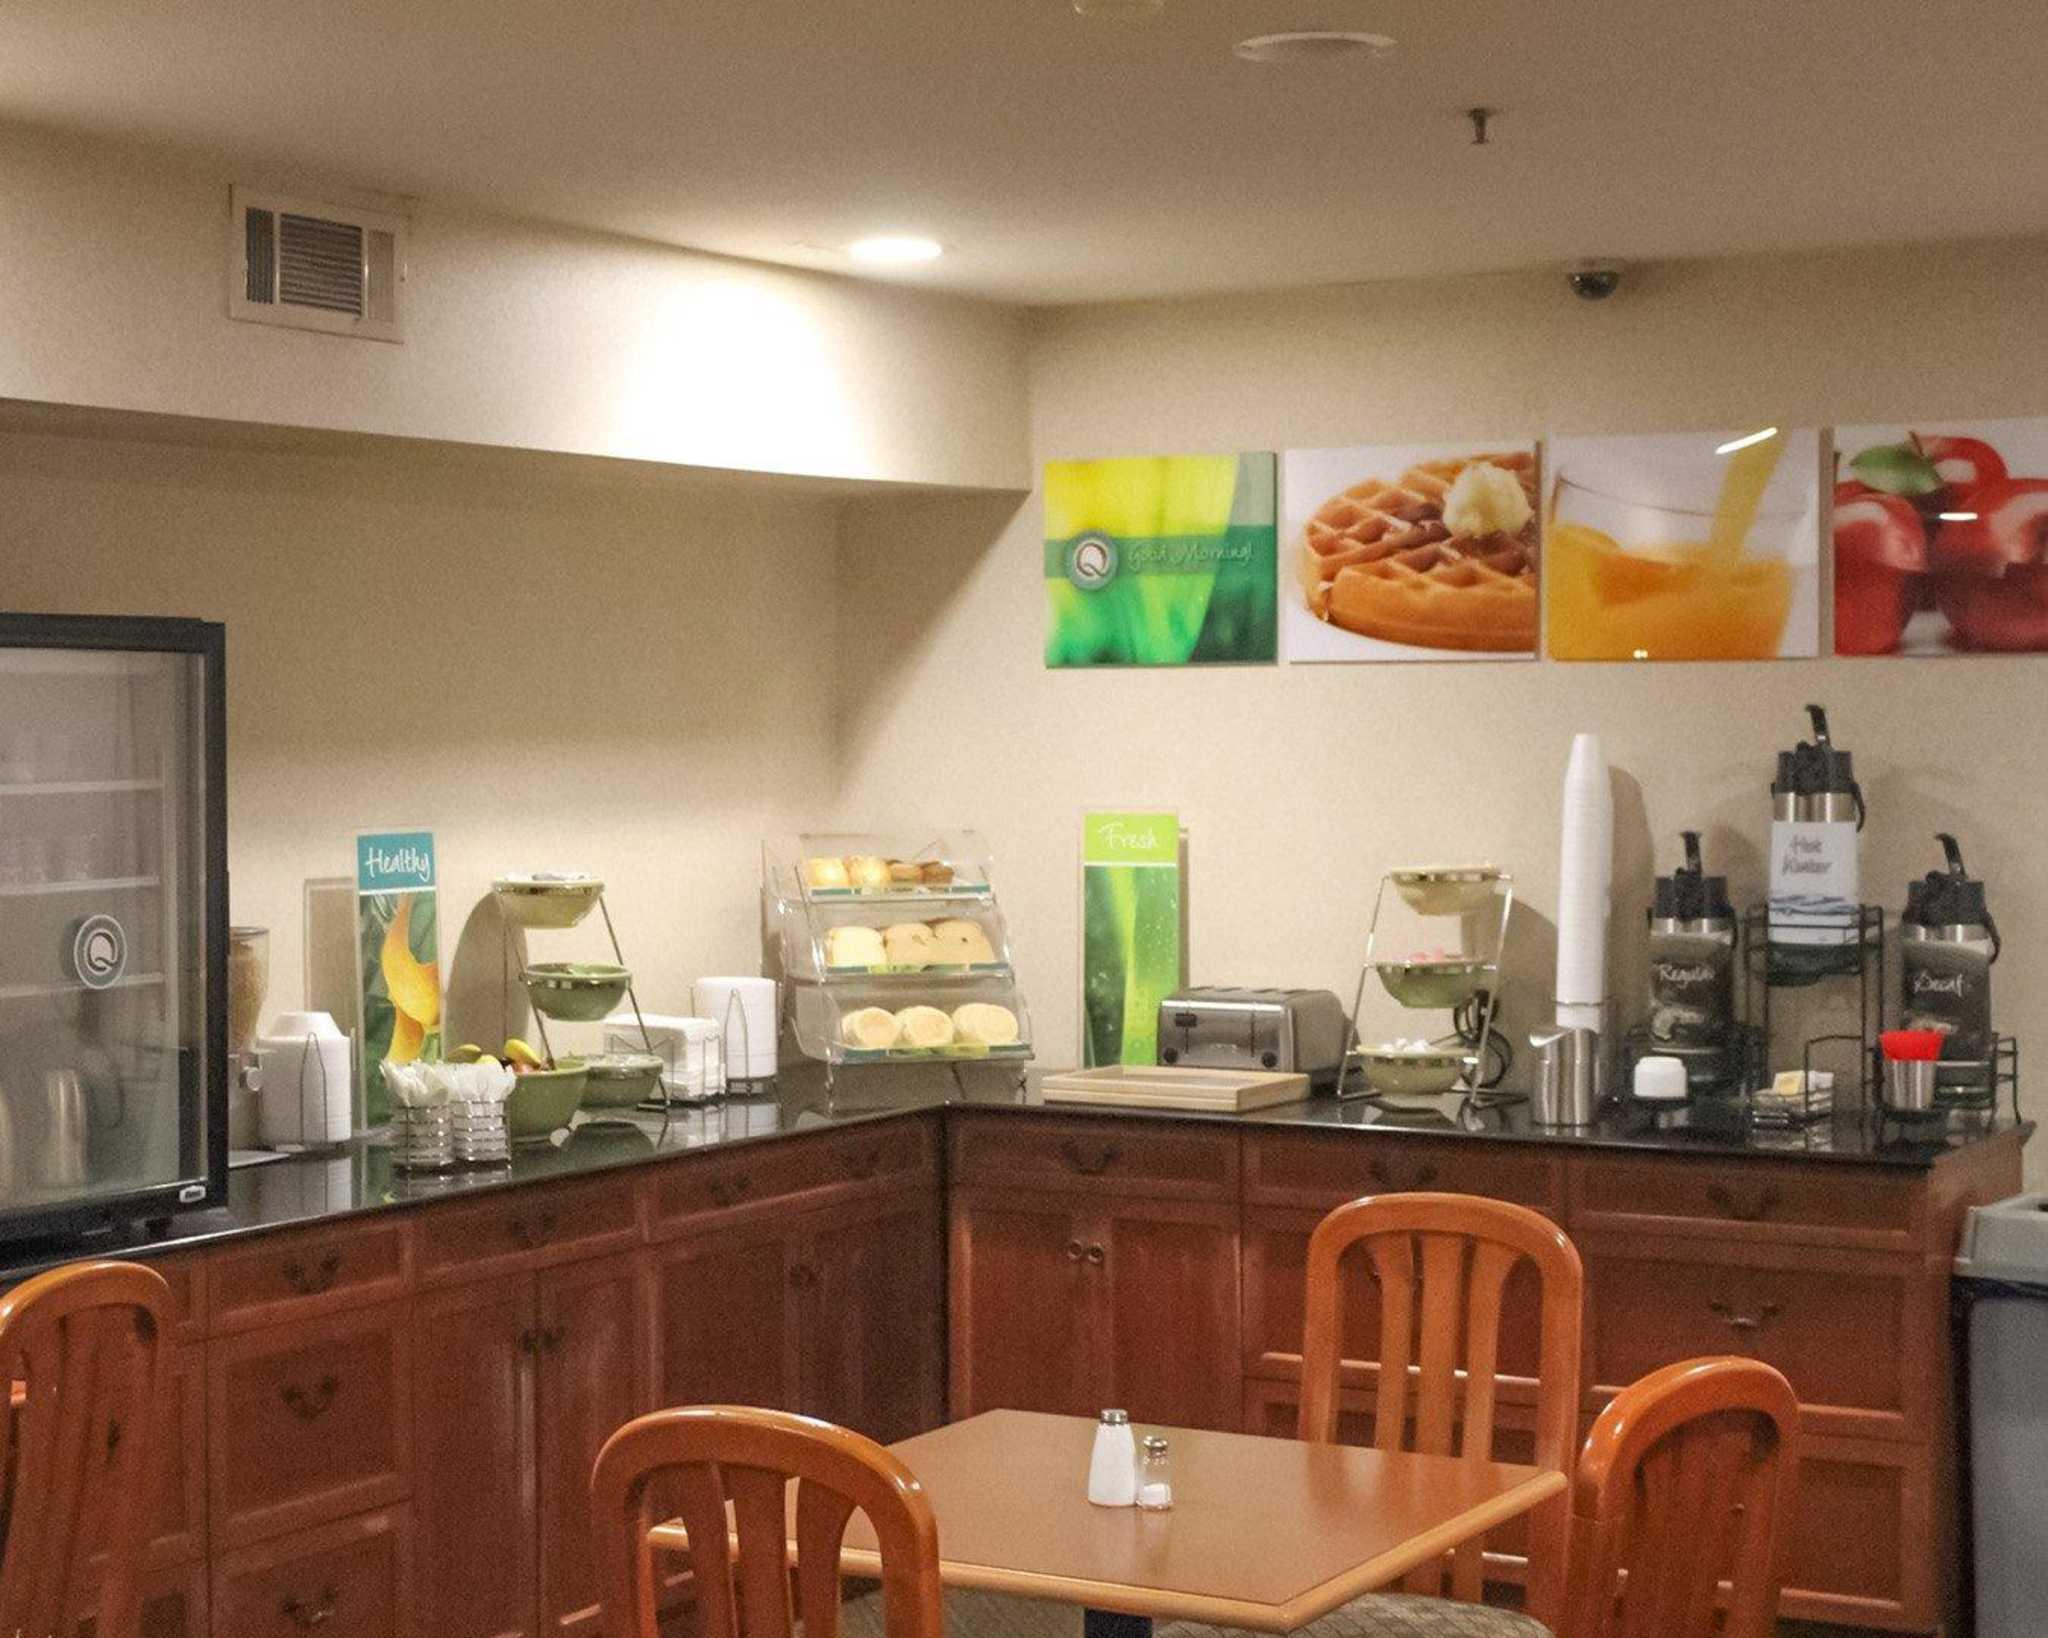 Quality Inn & Suites Oceanside Near Camp Pendleton image 10